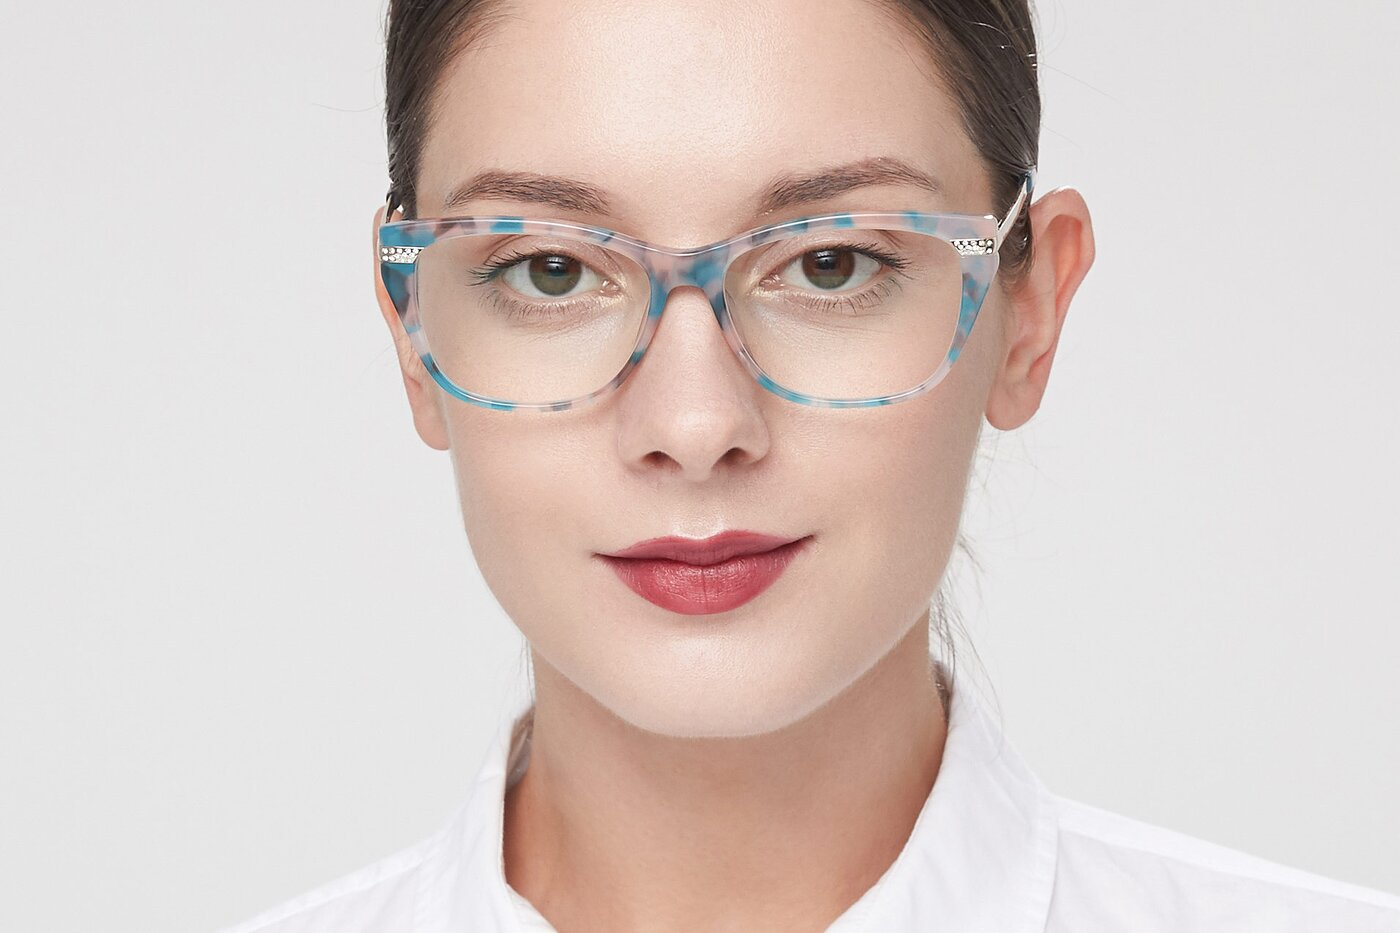 Floral Hipster Acetate Cat-Eye Eyeglasses